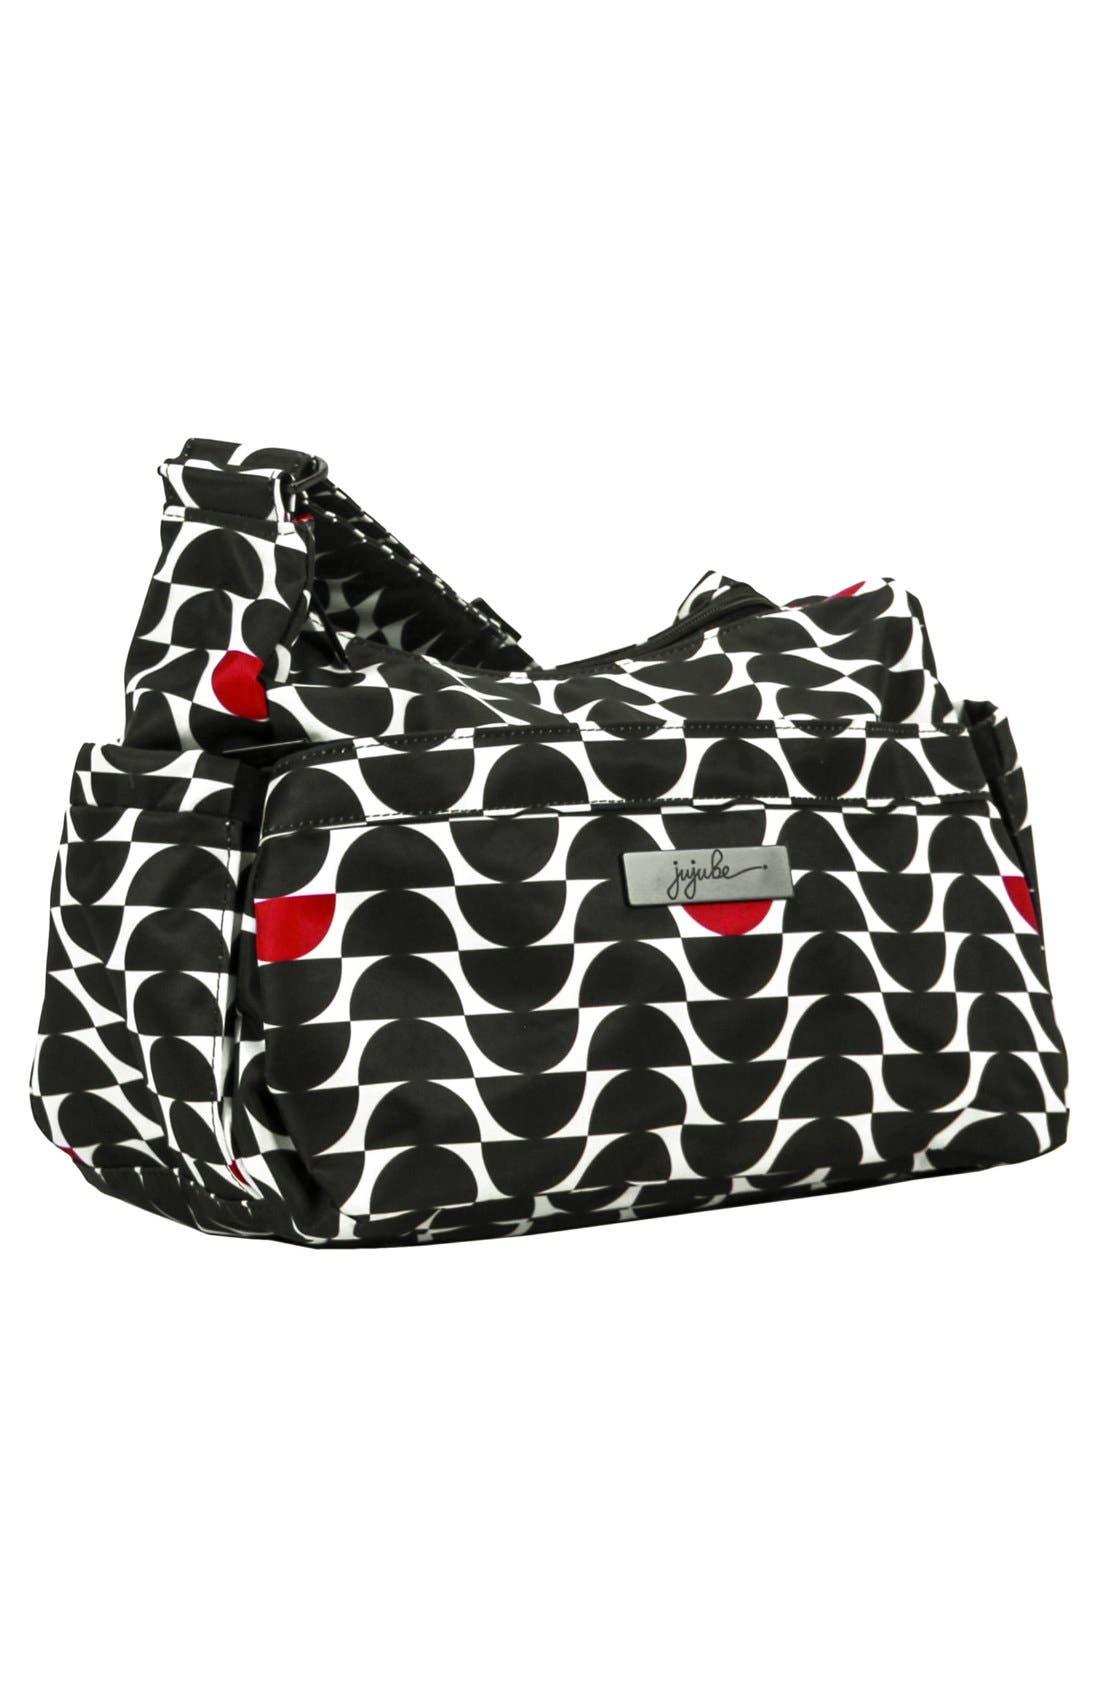 'HoboBe' Diaper Bag,                             Alternate thumbnail 3, color,                             Black Widow